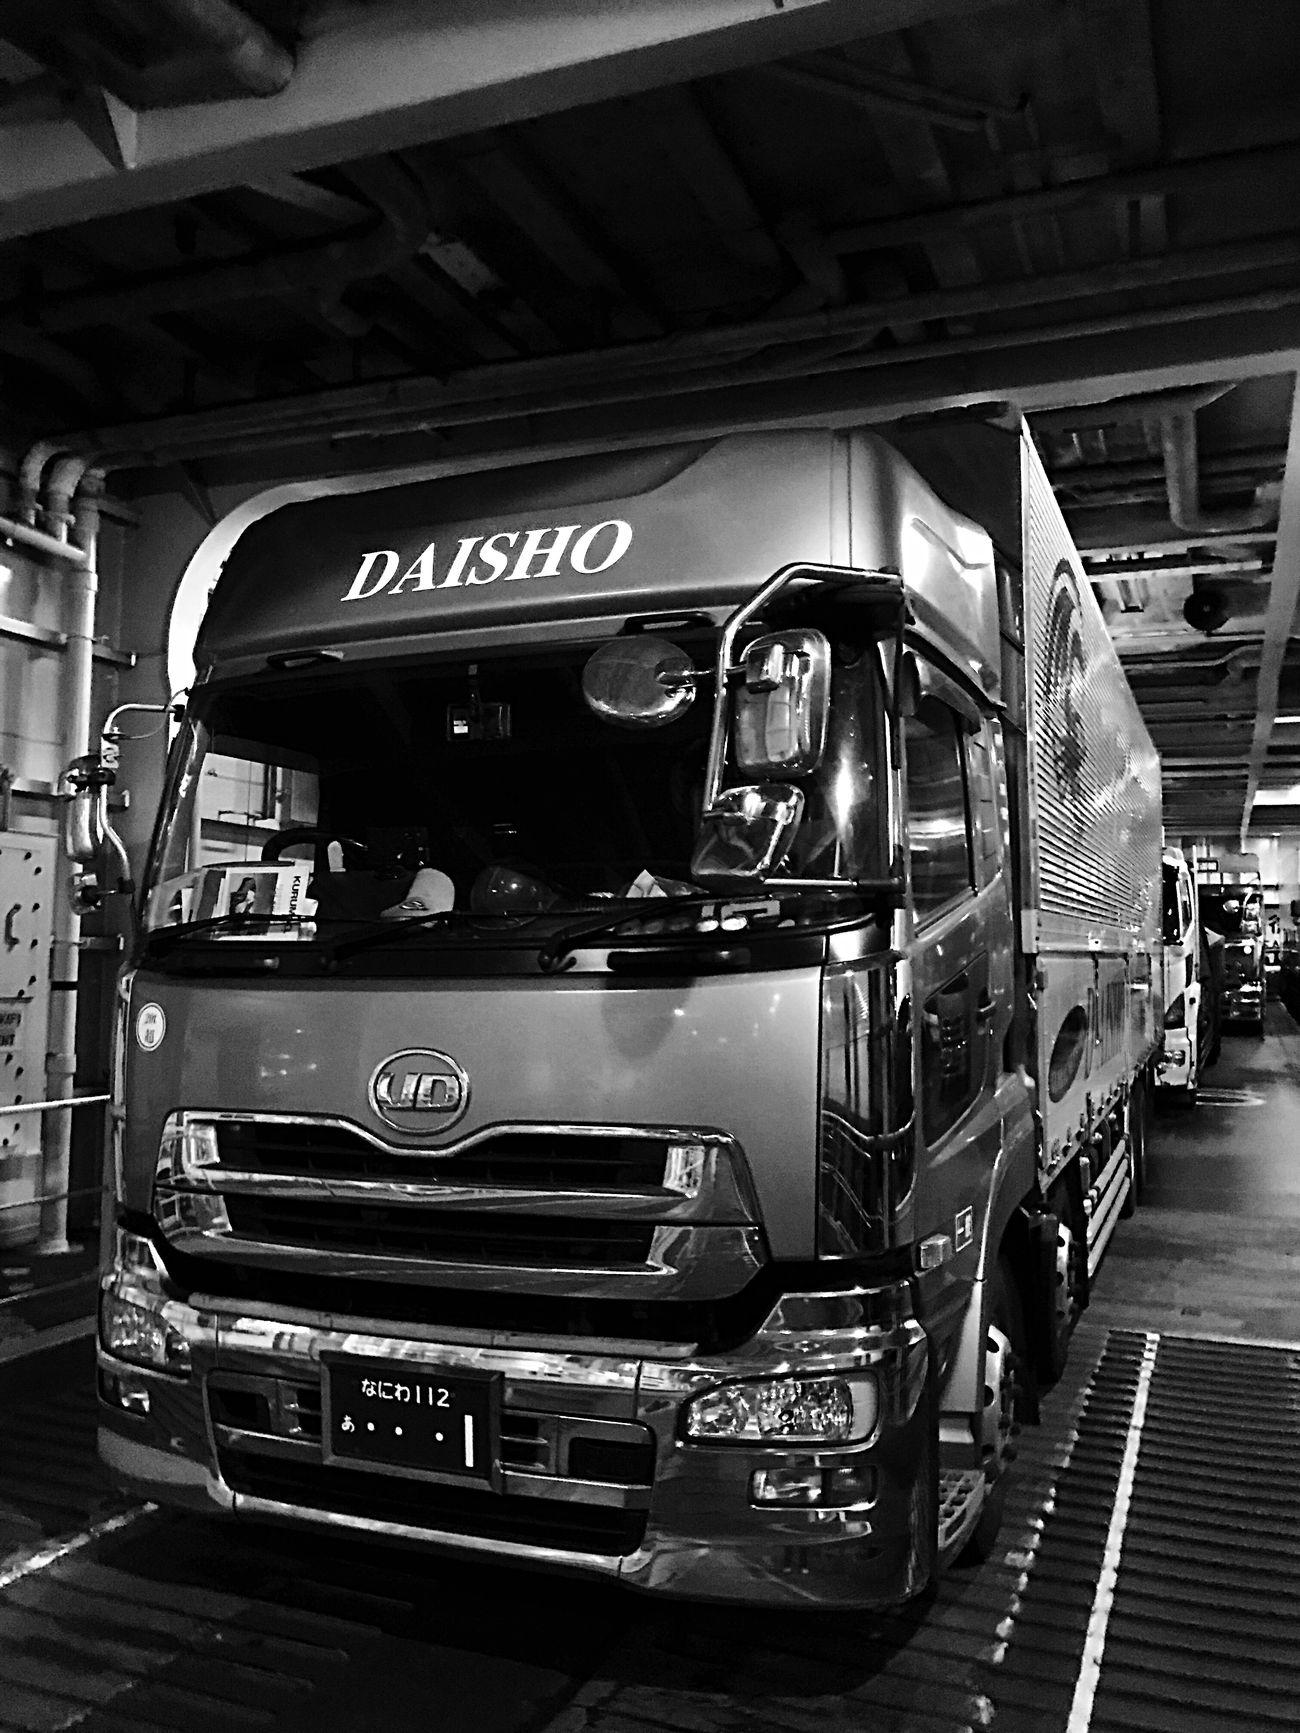 Truck Black And White Nissan Trucking Trucks EyeEm Best Shots EyeEm Light And Shadow EyeEm Best Edits EyeEm Japan Self Portrait EyeEmBestPics EyeEm Gallery Japan Enjoying Life Japan Photography